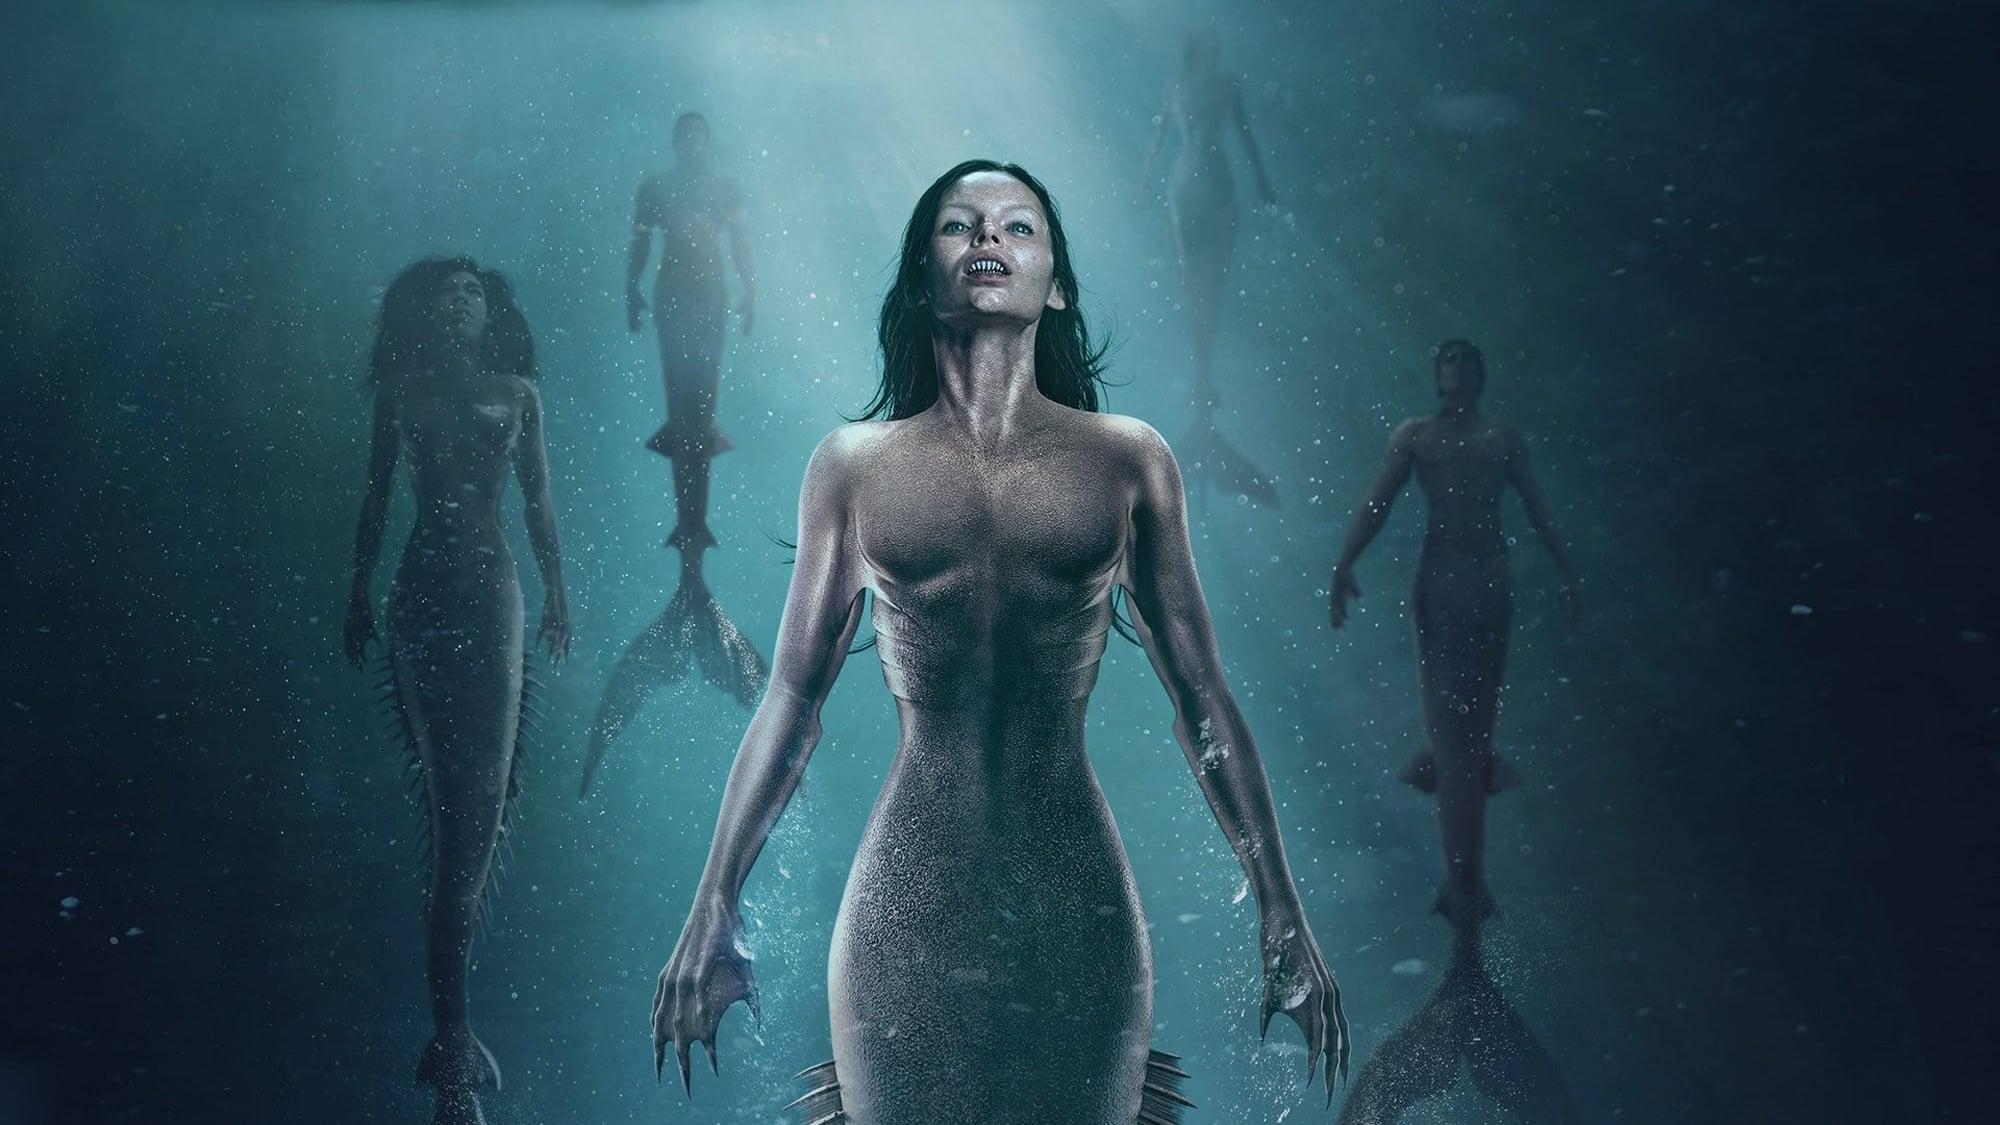 Siren cancelled after third season